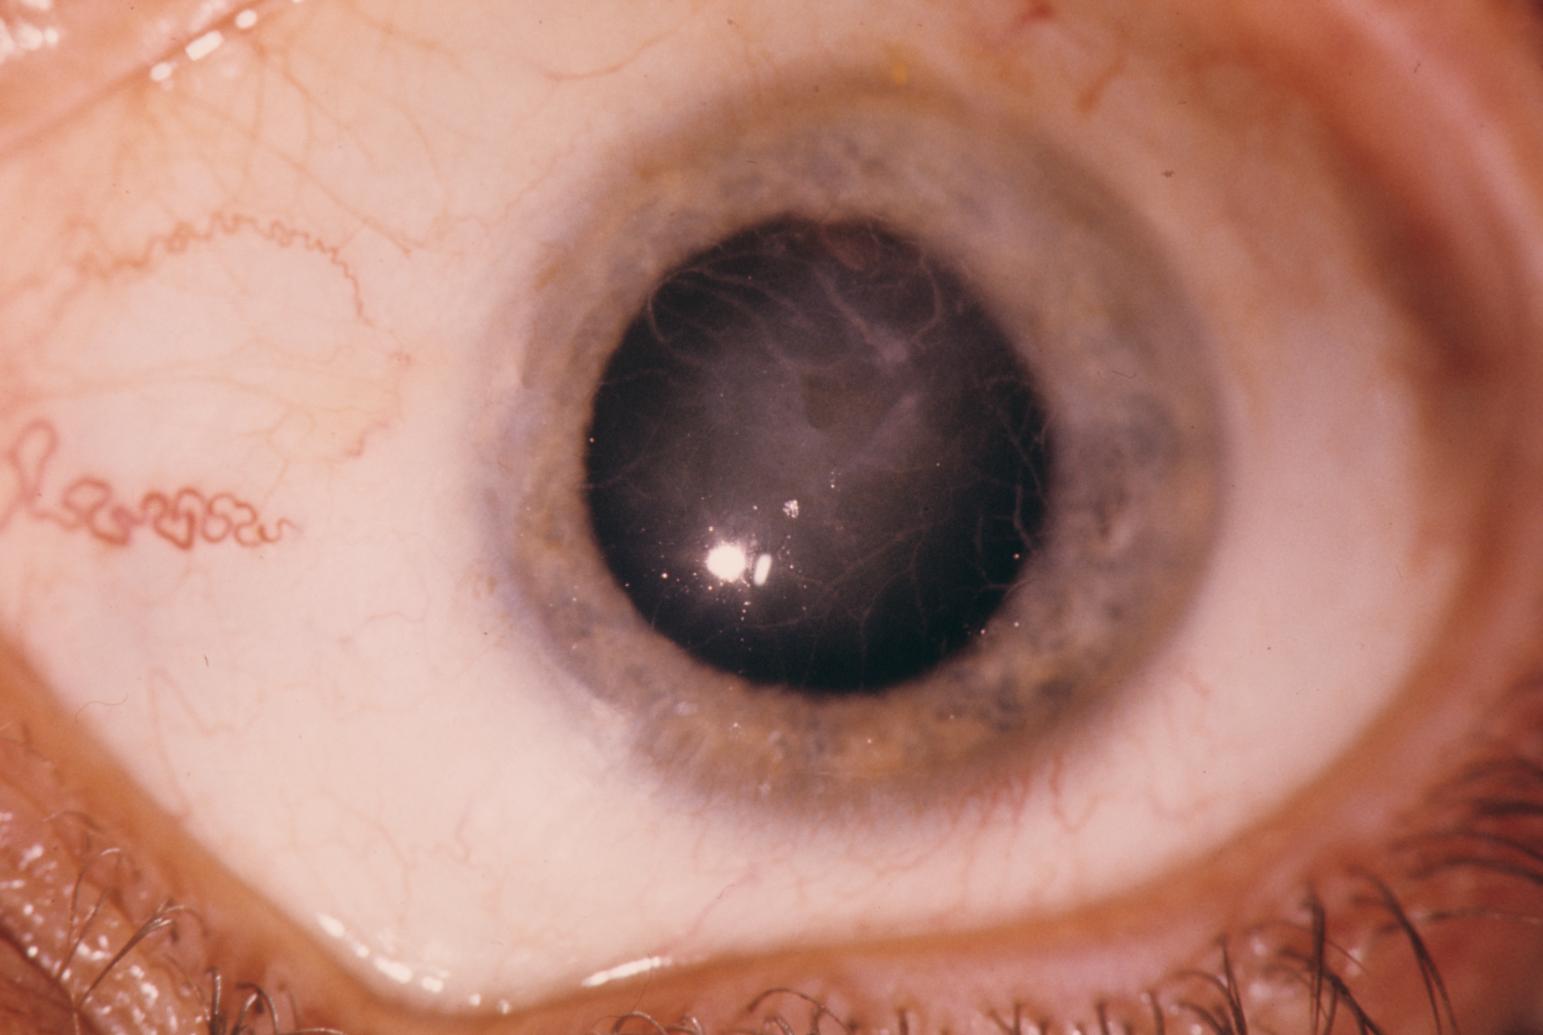 Lattice dystrophy of the cornea